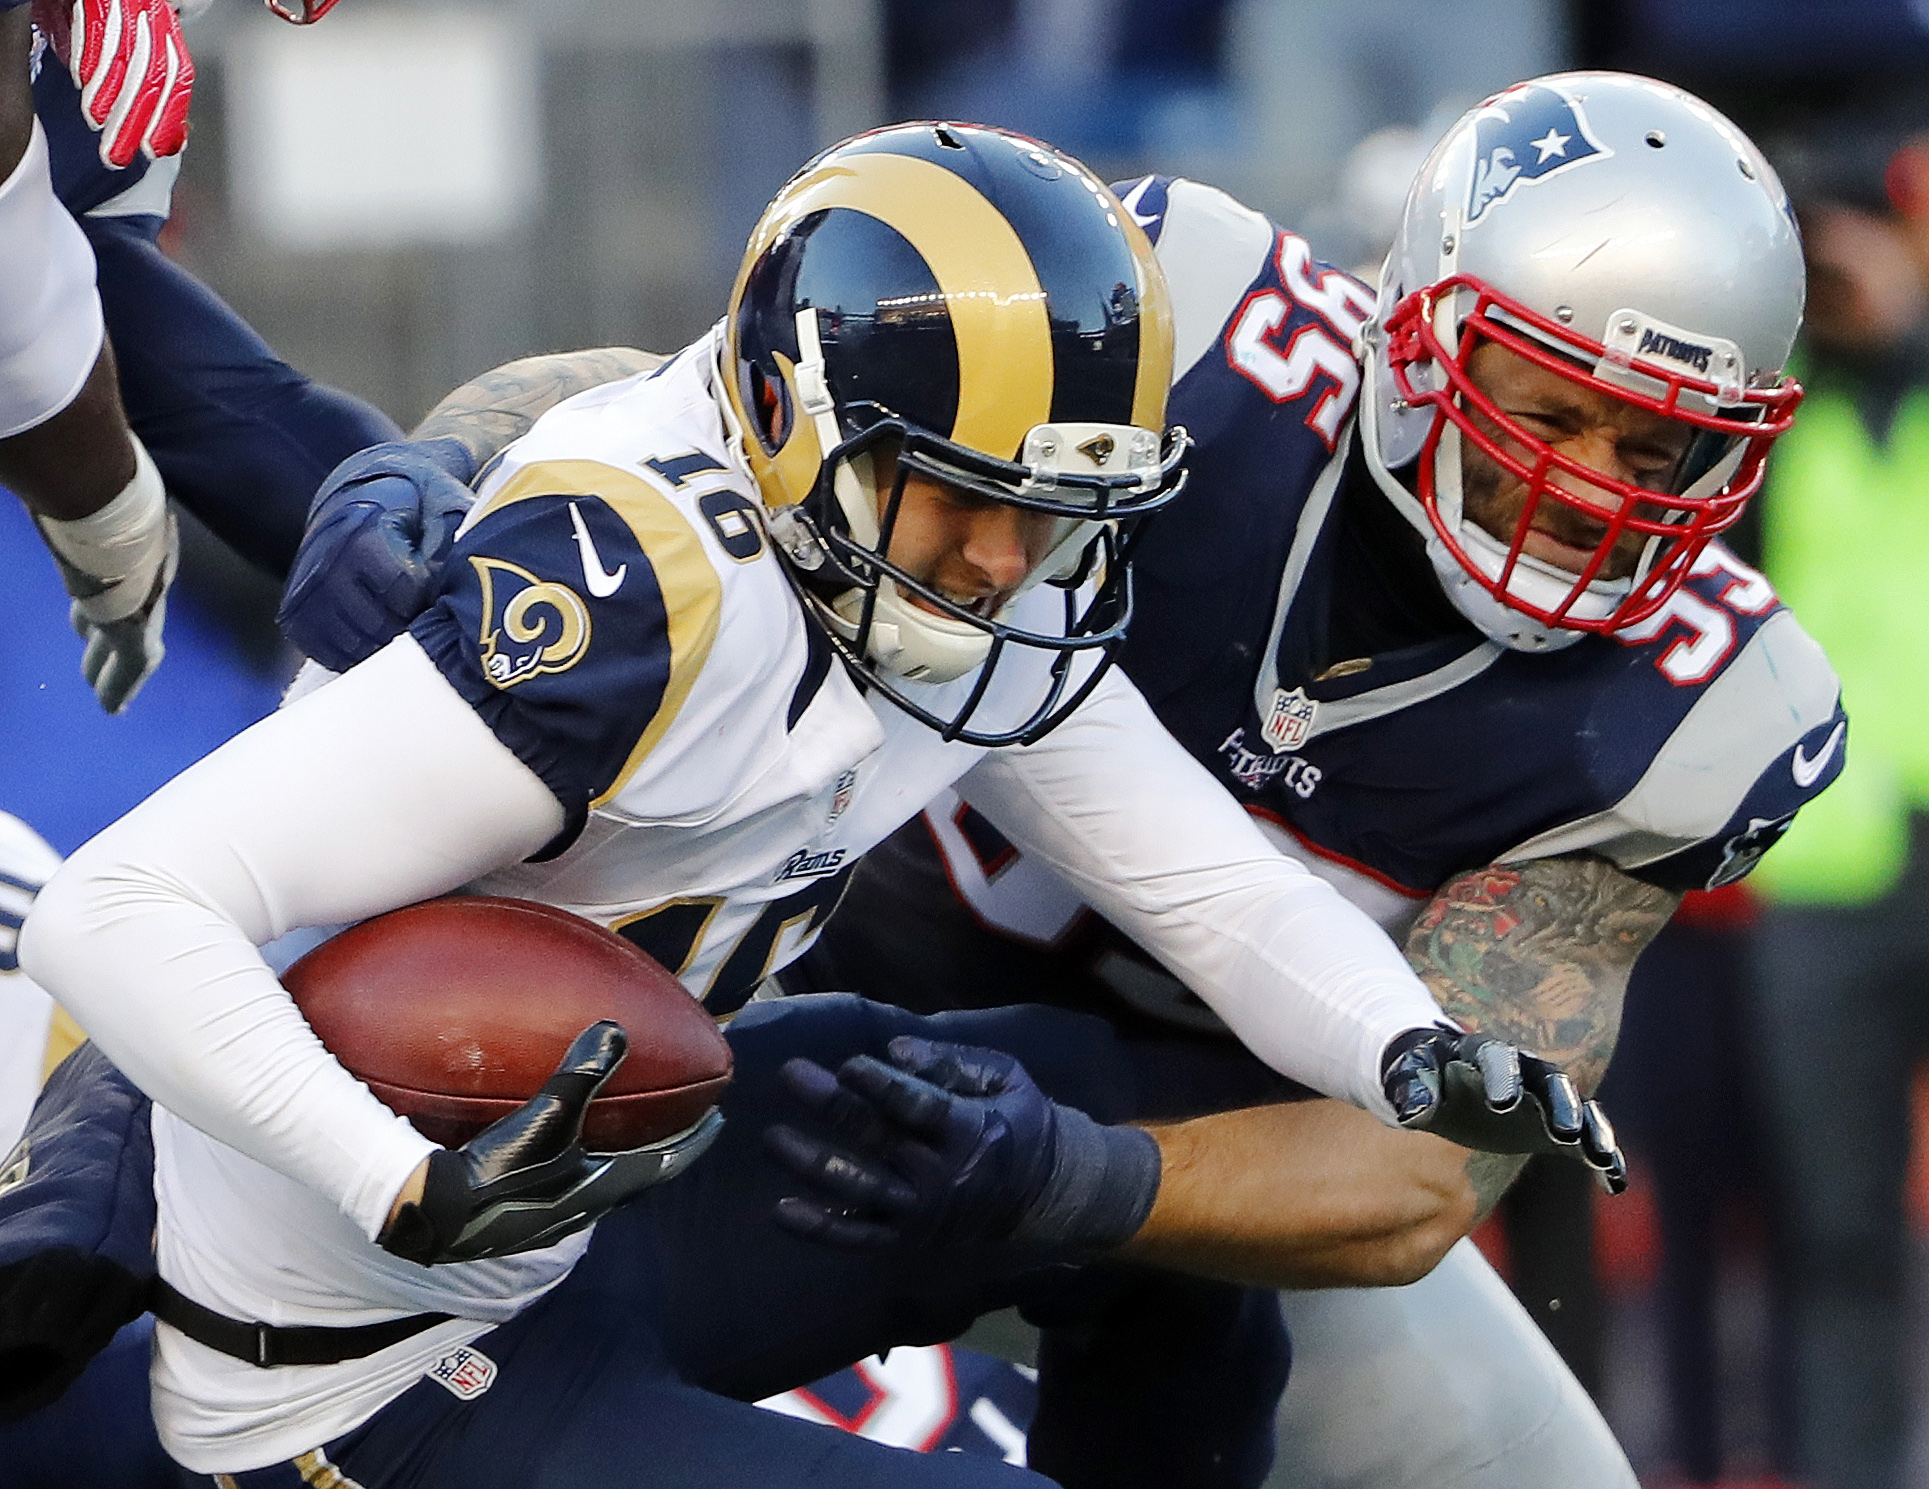 Former Los Angeles Rams DE Chris Long sacks Rams QB Jared Goff